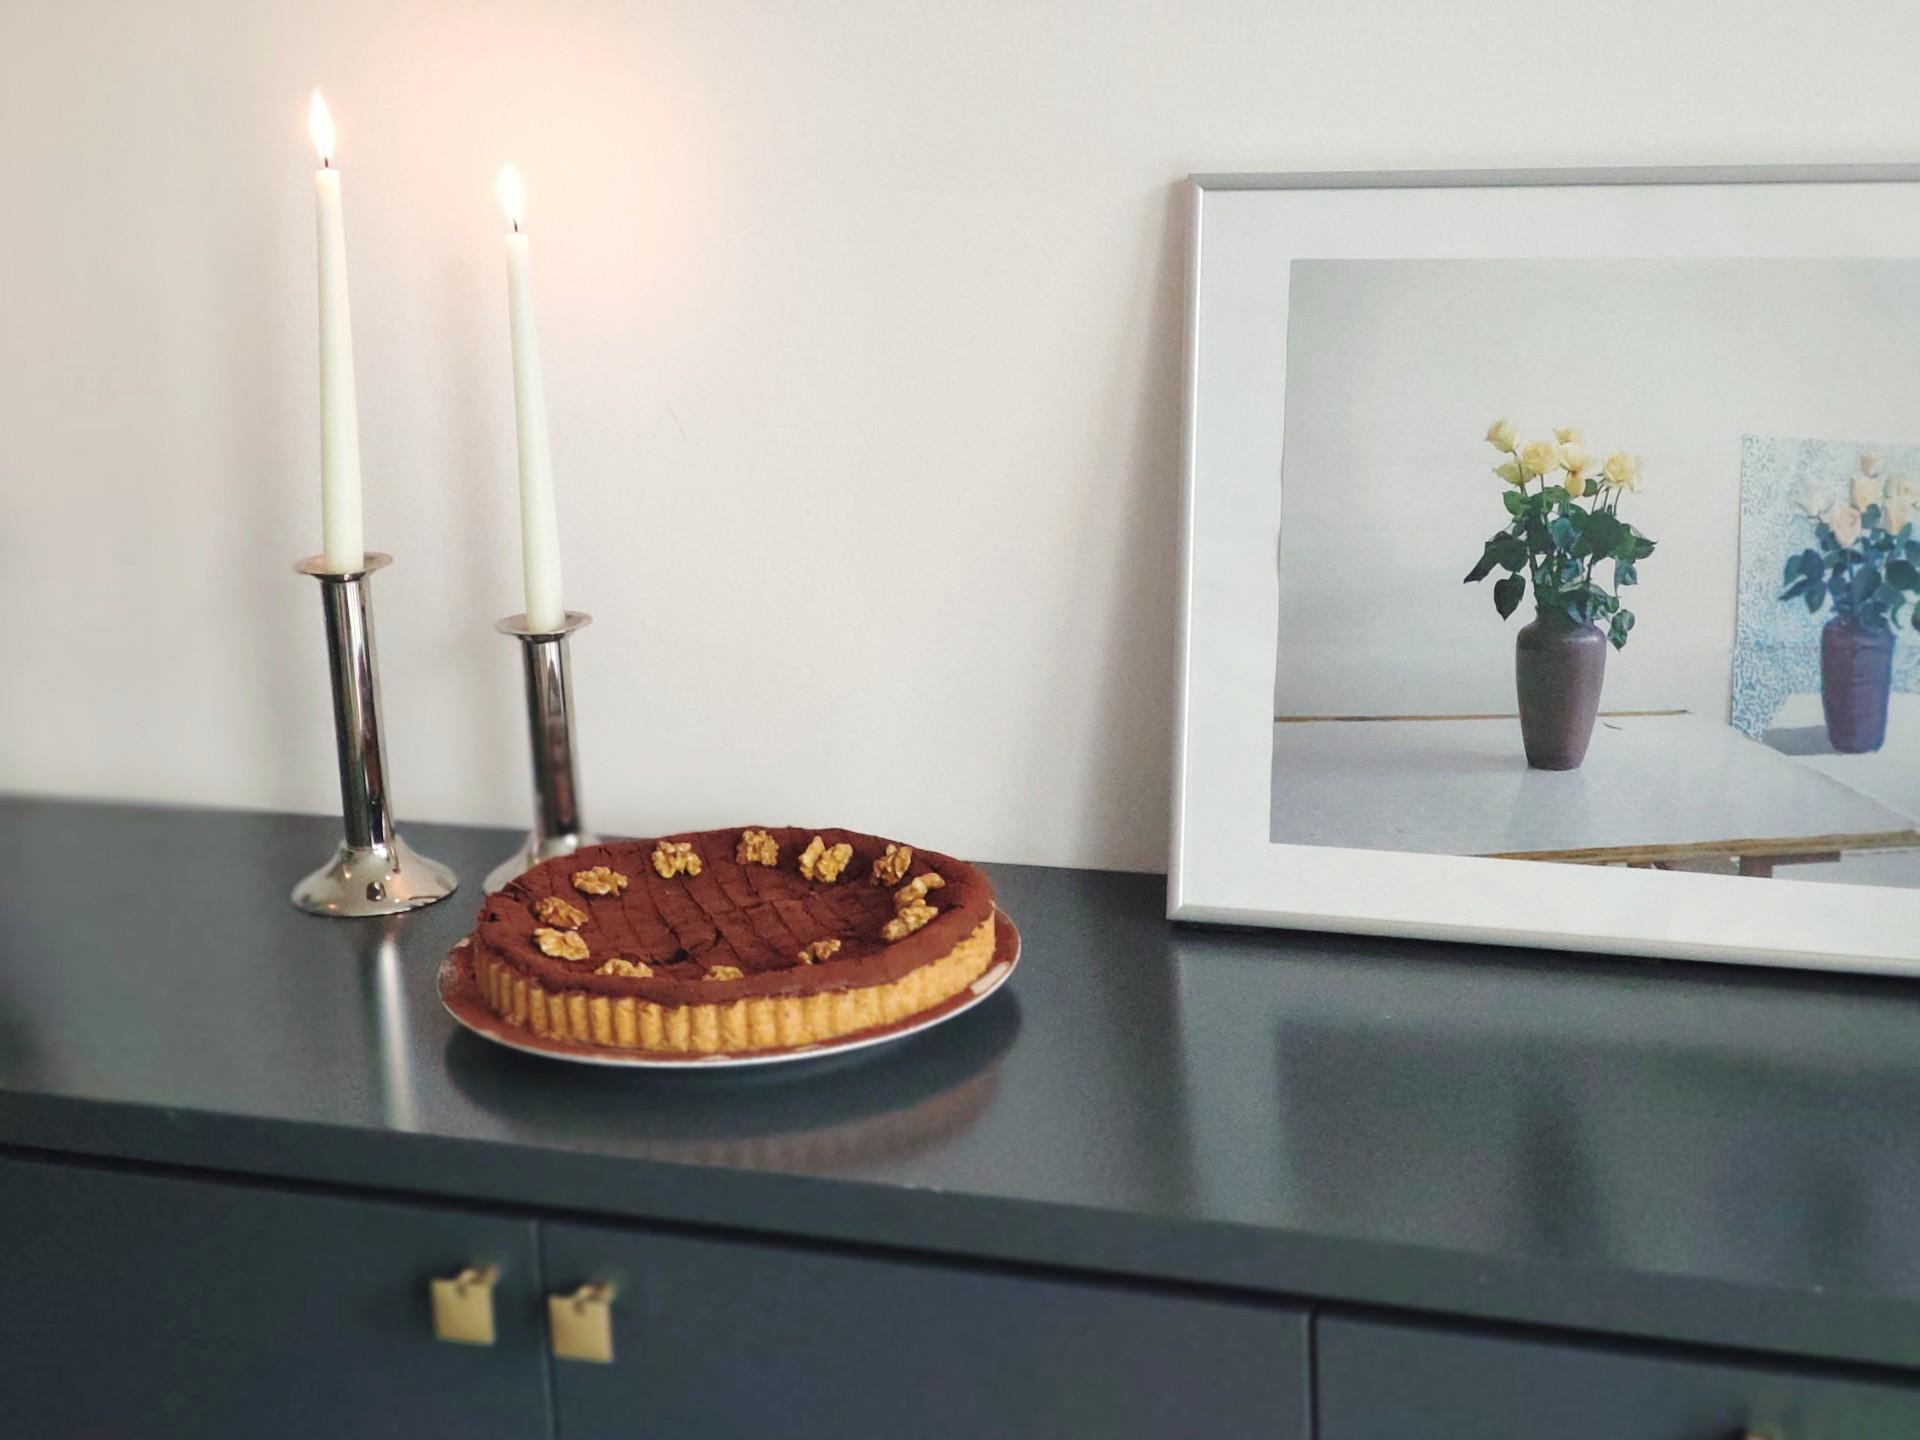 Schokoladen-Walnuss-Tarte